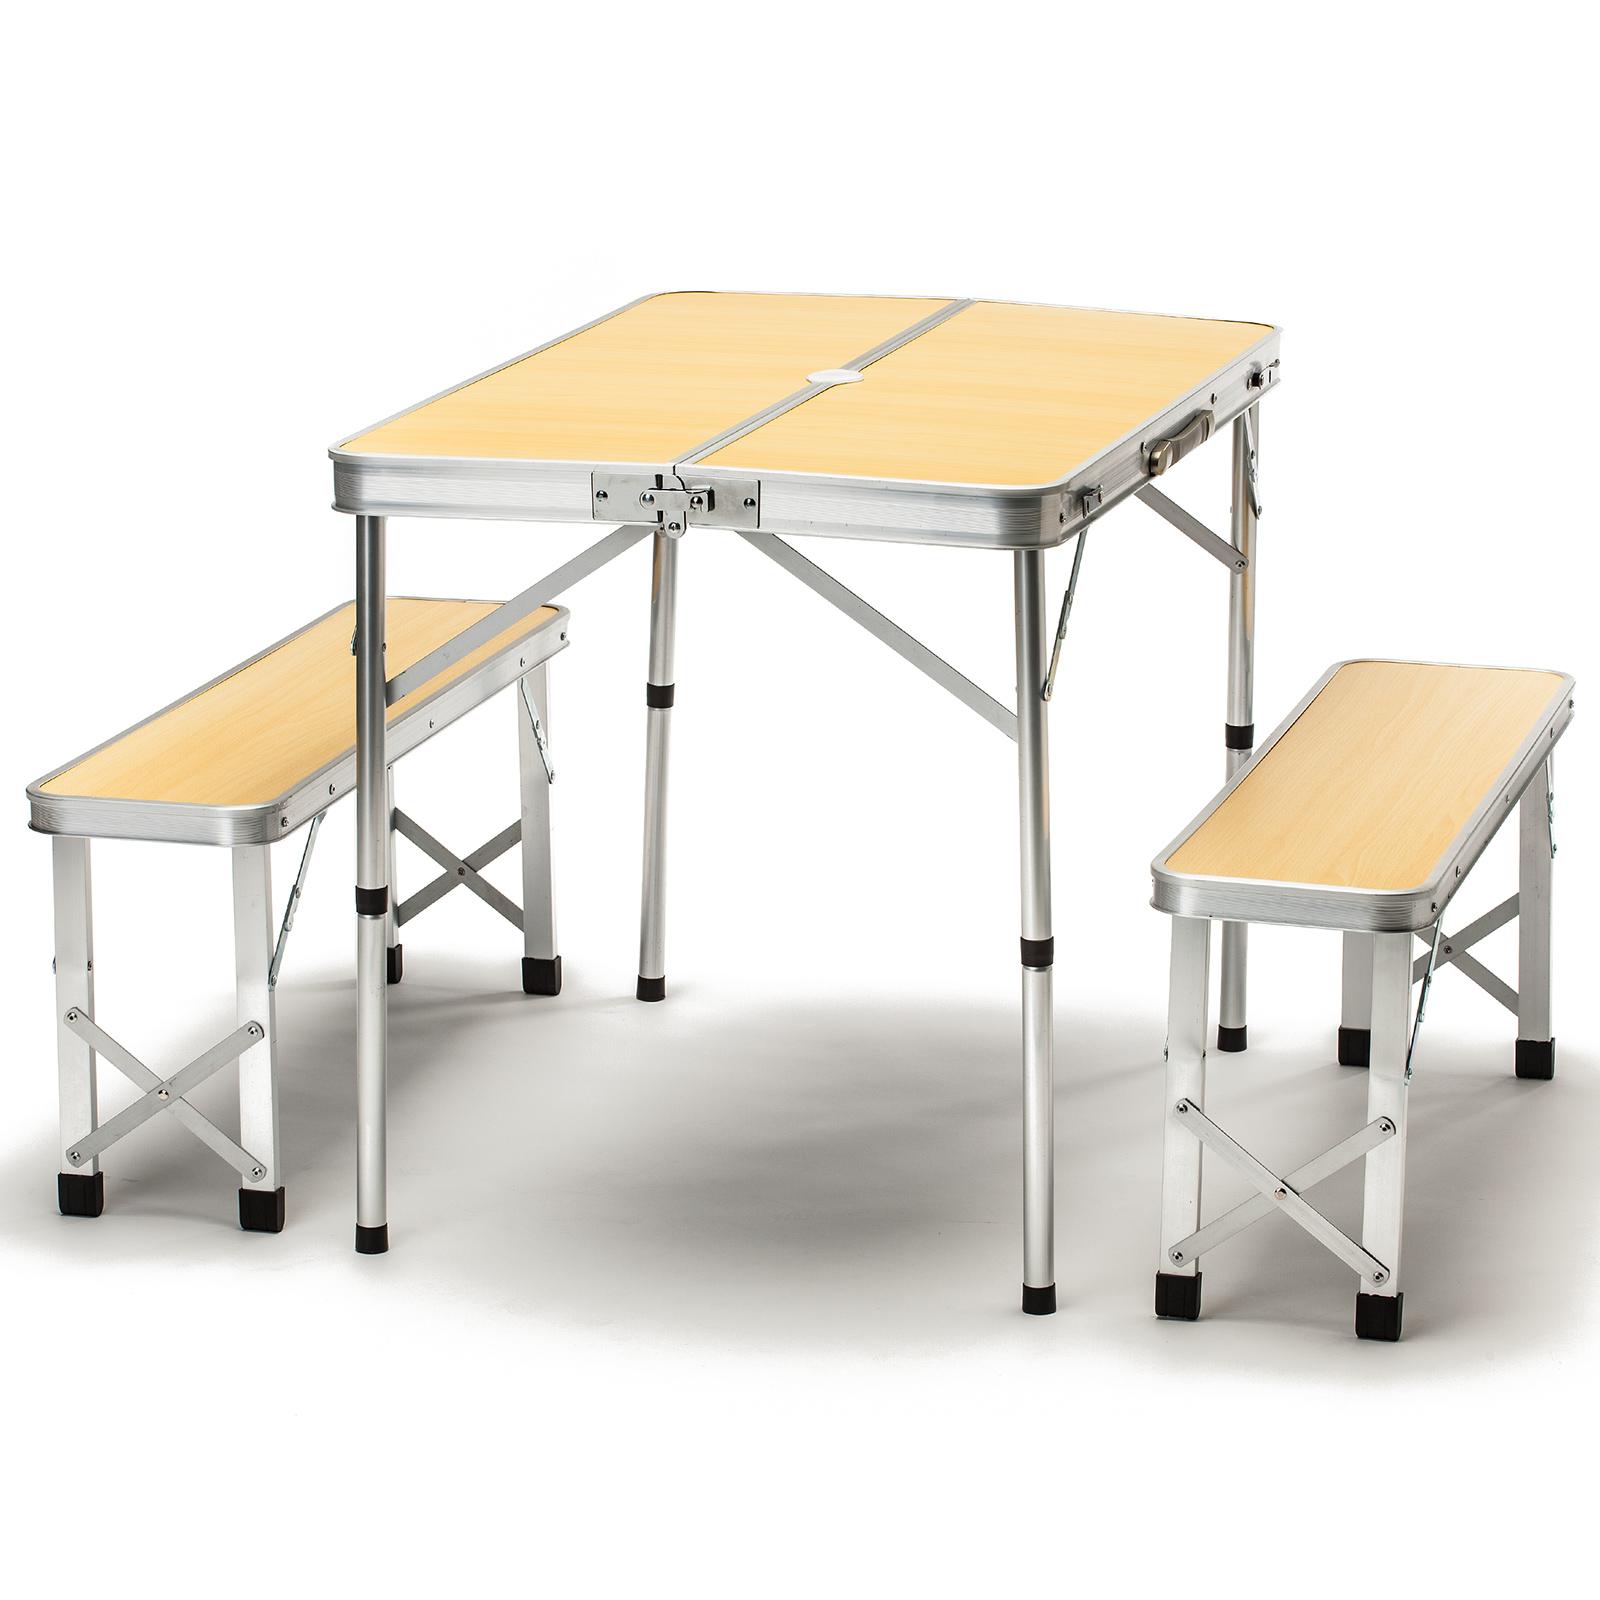 skandika ensemble table bancs camping pique nique pliable en valise 4pers neuf ebay. Black Bedroom Furniture Sets. Home Design Ideas